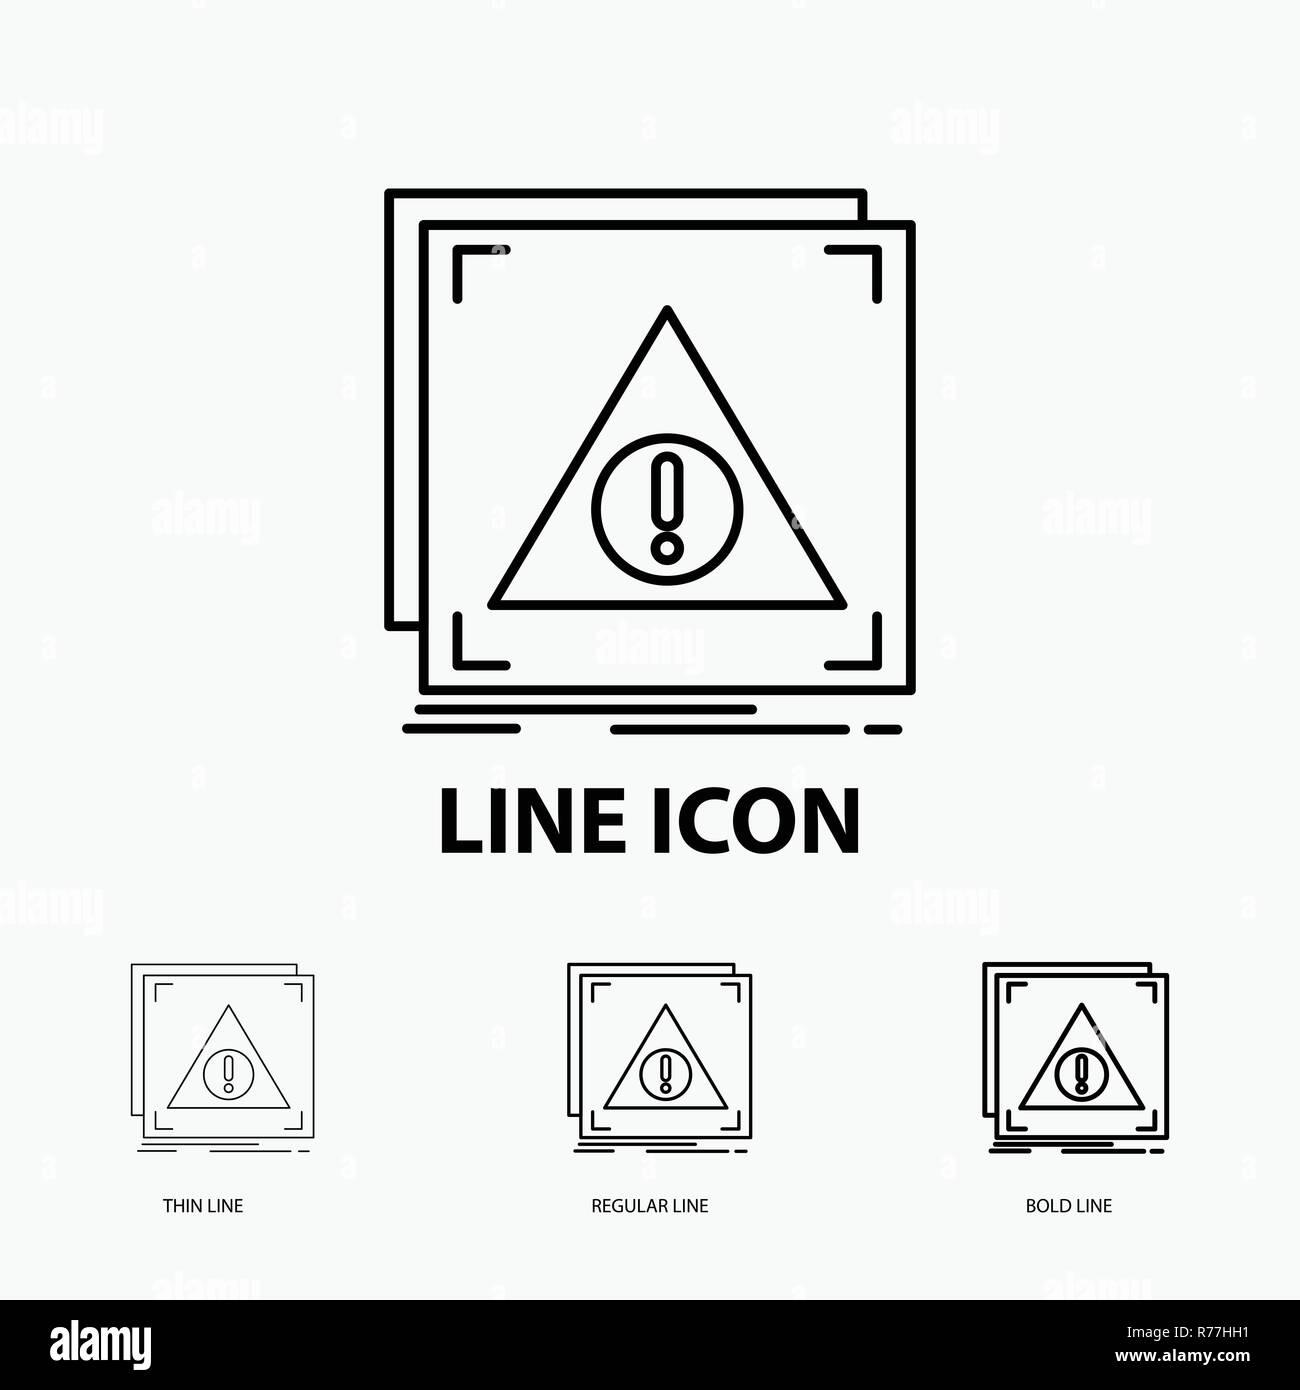 Error, Application, Denied, server, alert Icon in Thin, Regular and Bold Line Style. Vector illustration - Stock Image